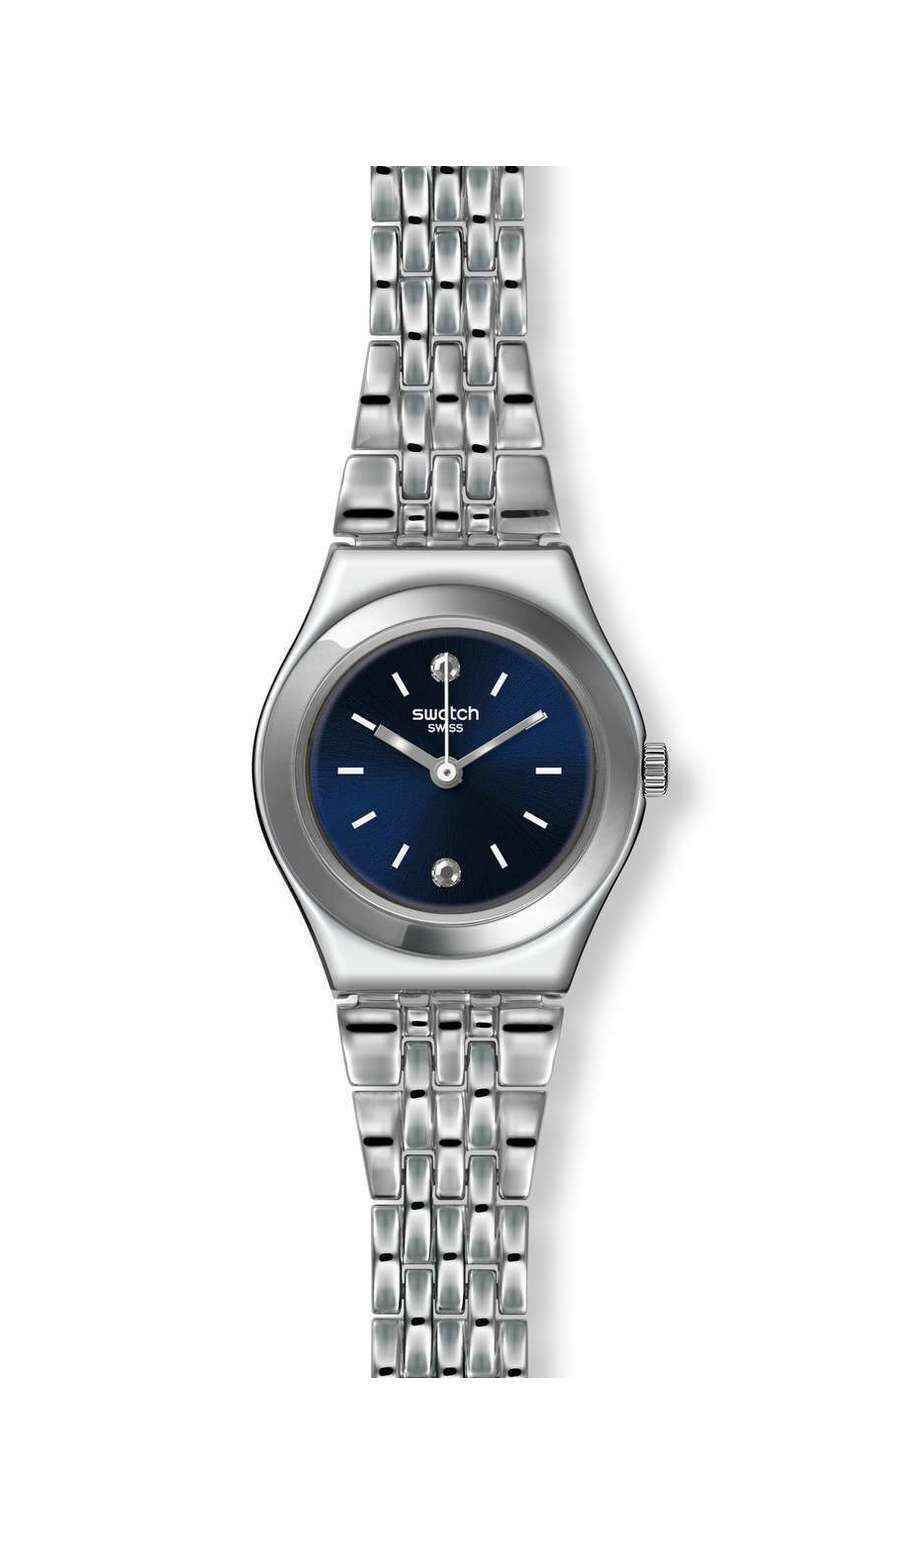 Swatch - SLOANE - 1